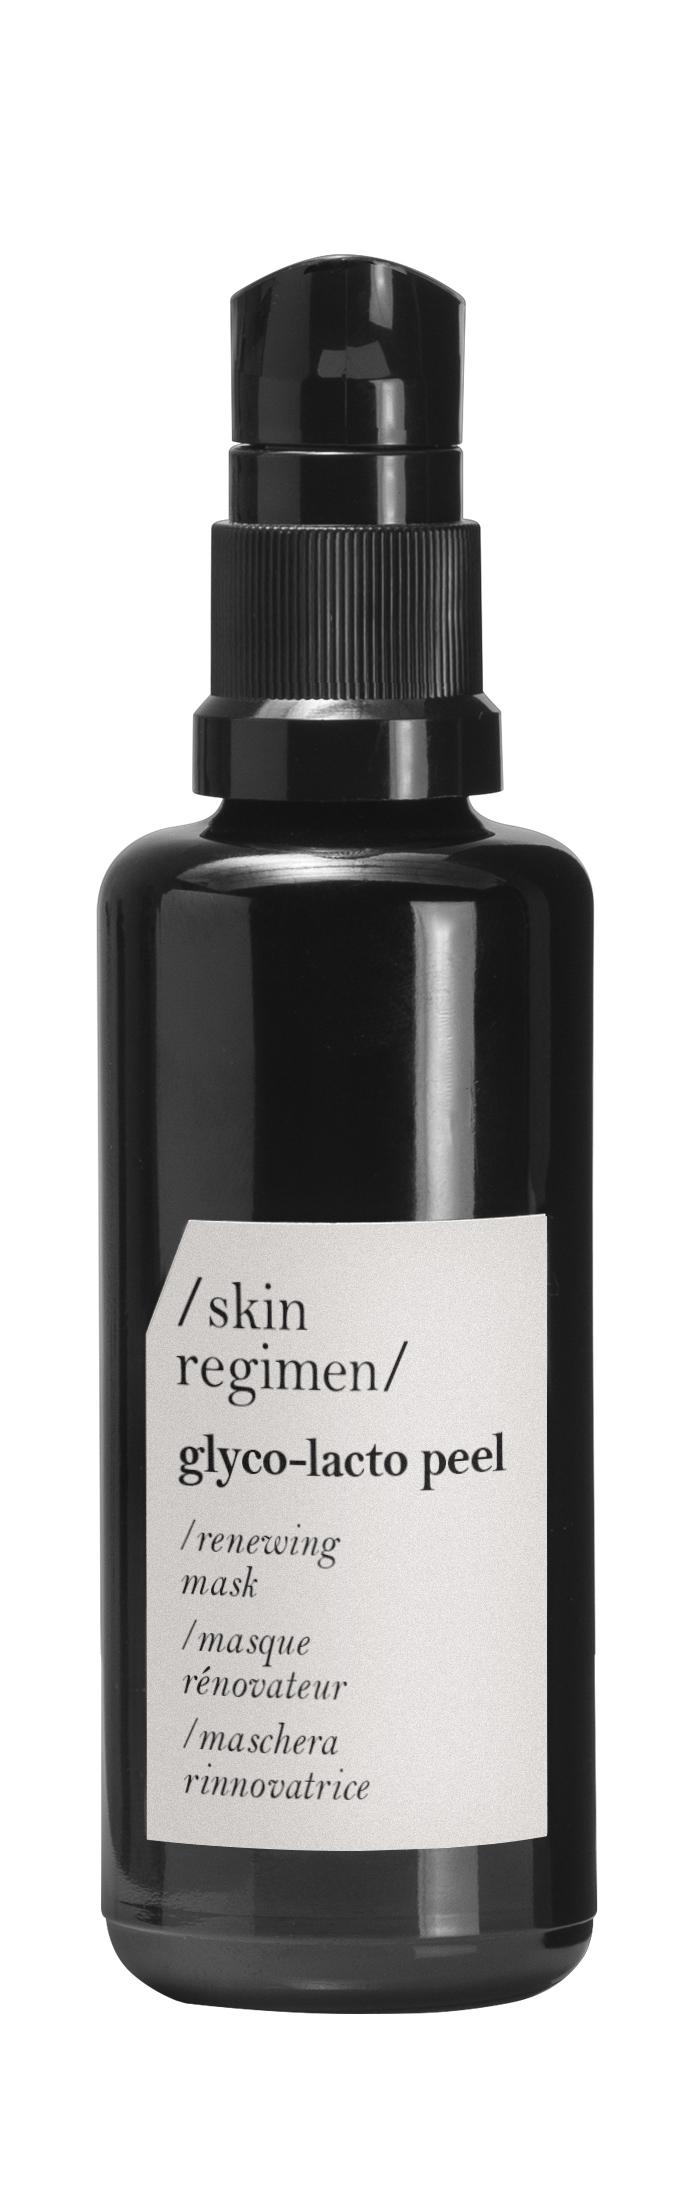 Comfort Zone Skin Regimen Glyco-Lacto Peel, 50 ml